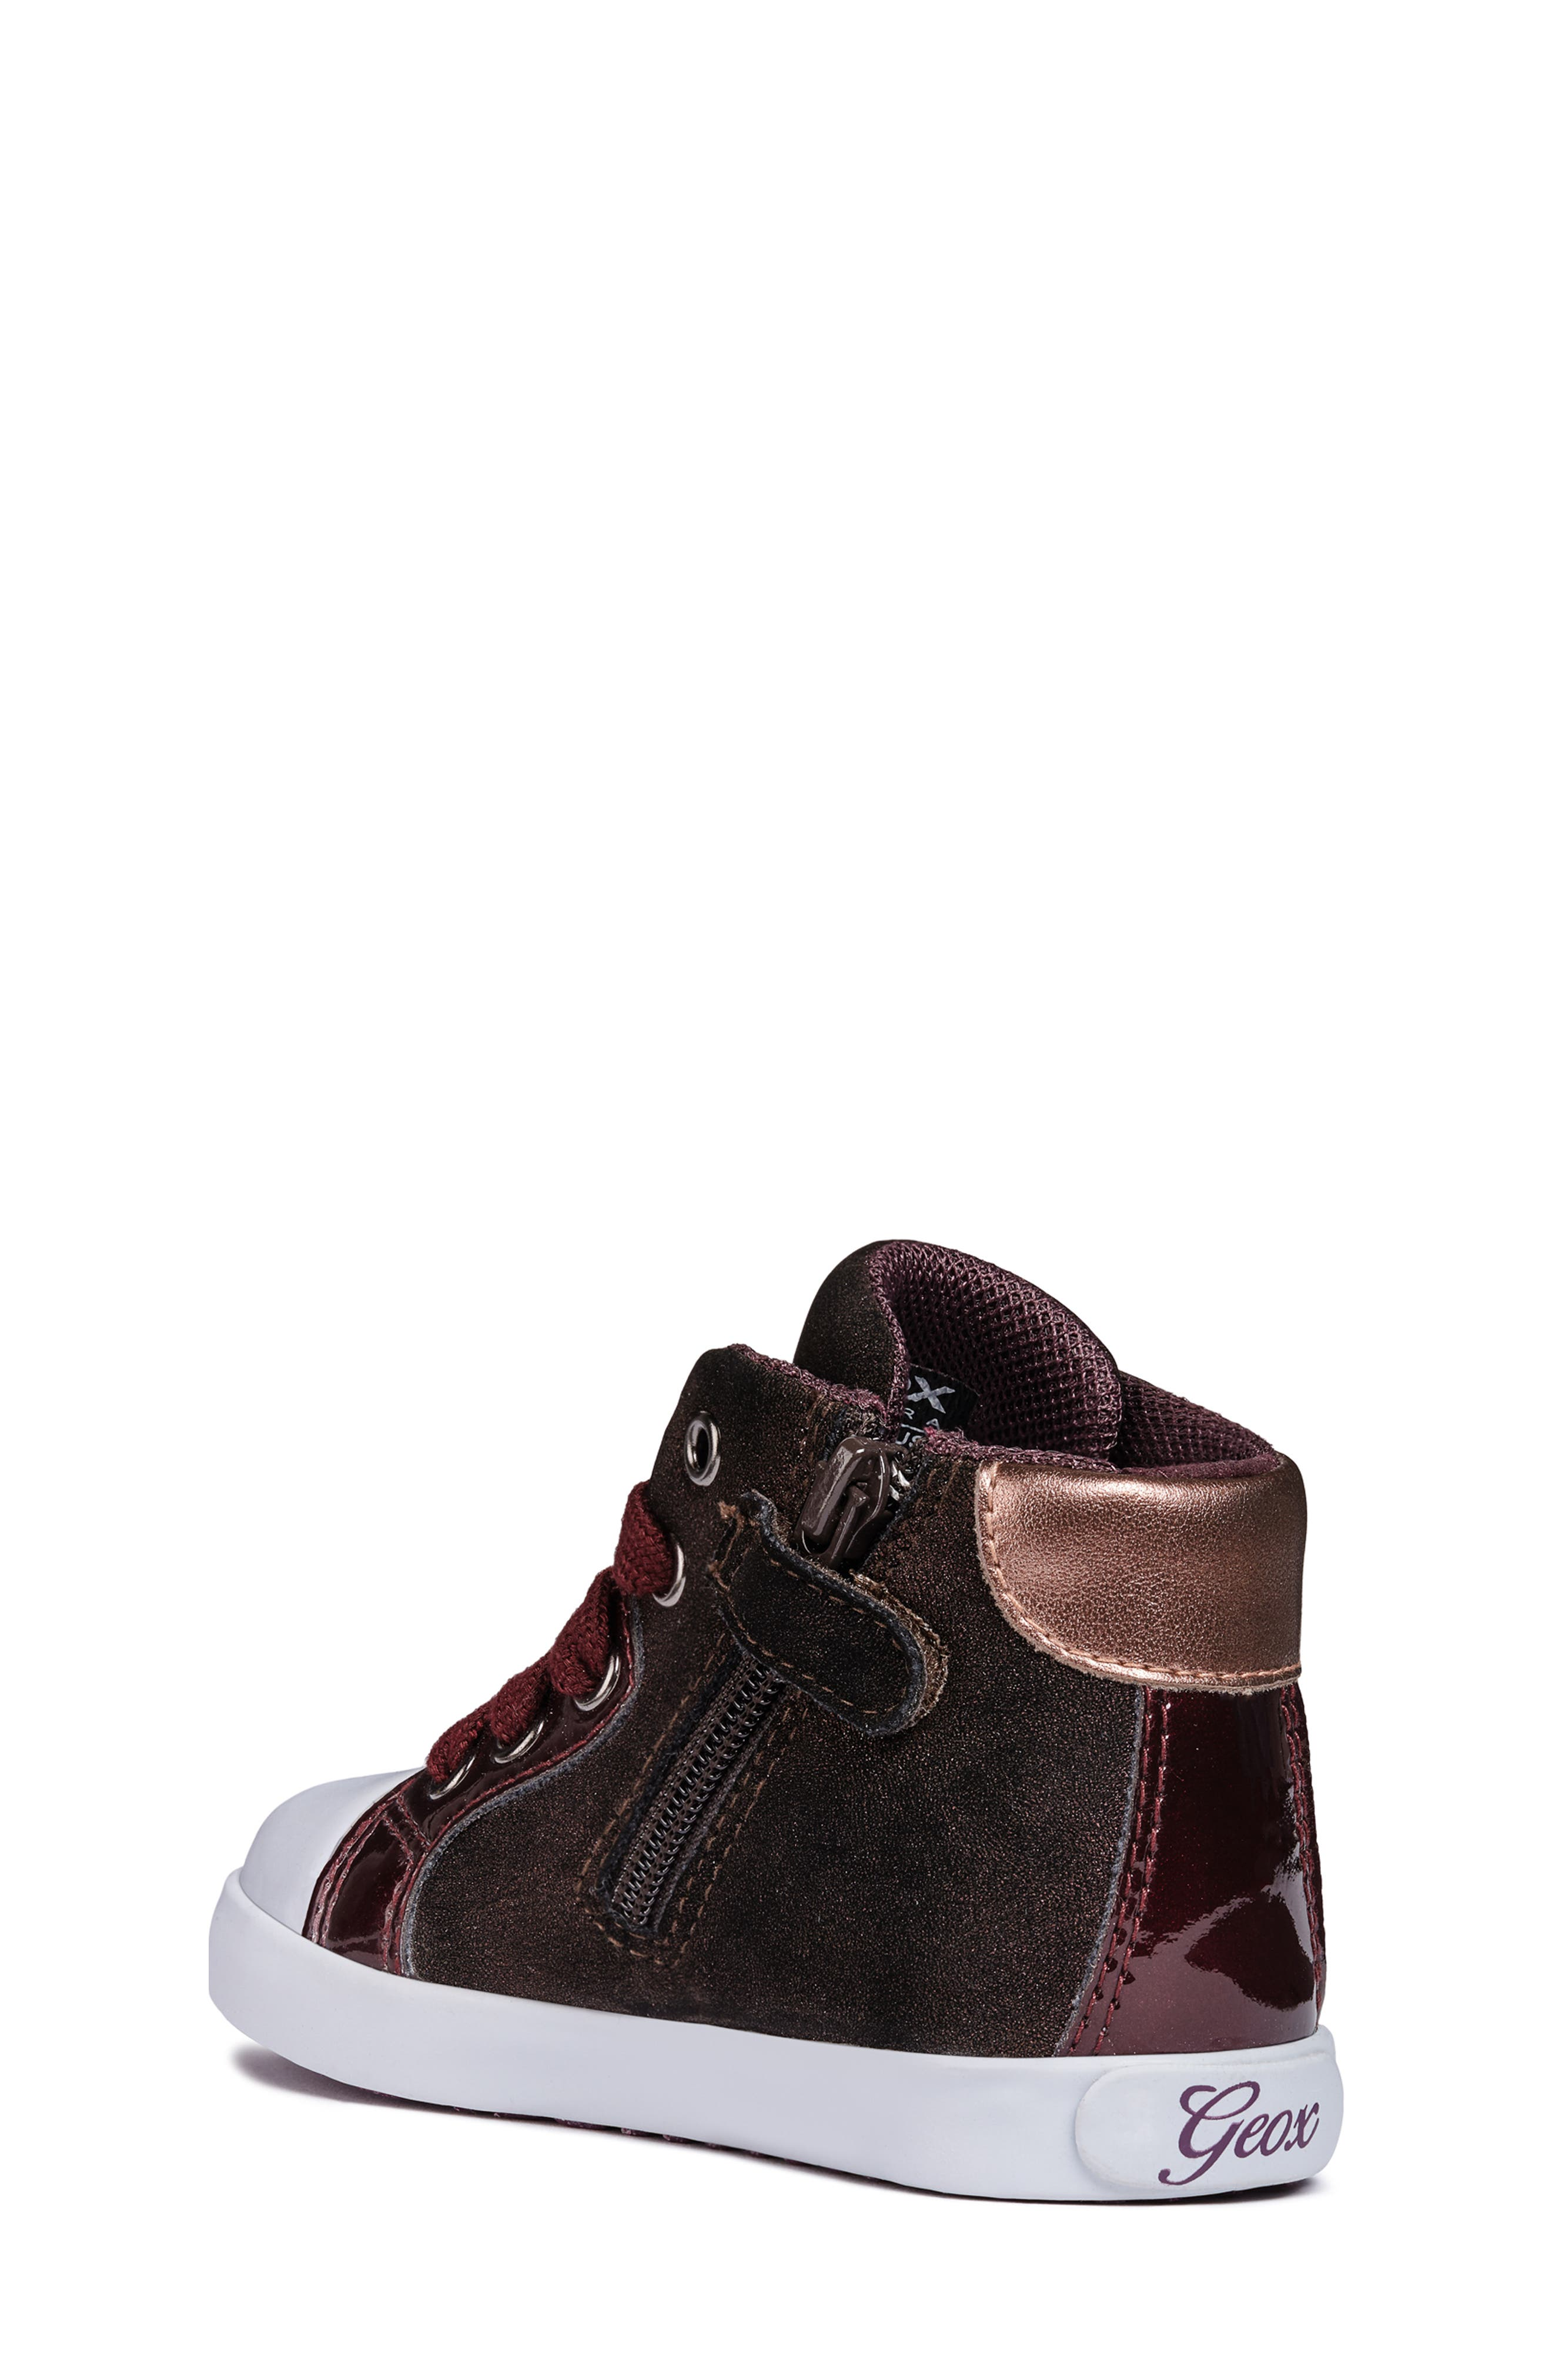 Kilwi Sparkle High Top Sneaker,                             Alternate thumbnail 2, color,                             DARK BURGUNDY